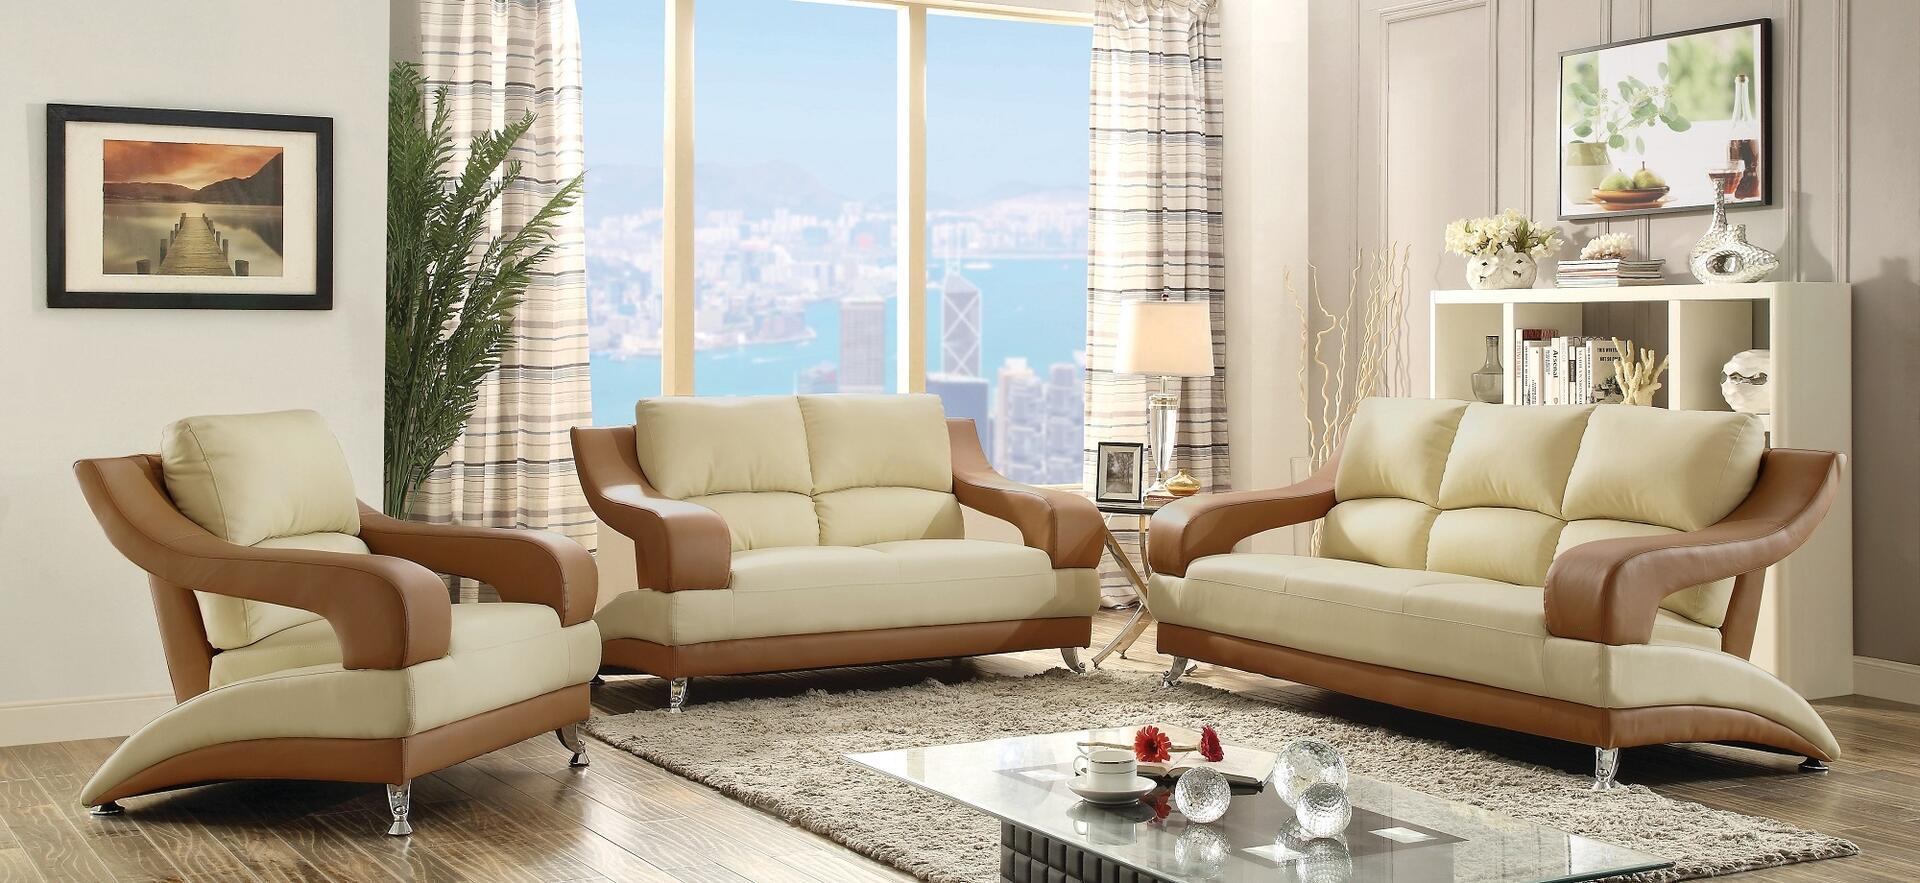 Glory furniture g250set living room sets appliances for Living room of satoshi tax